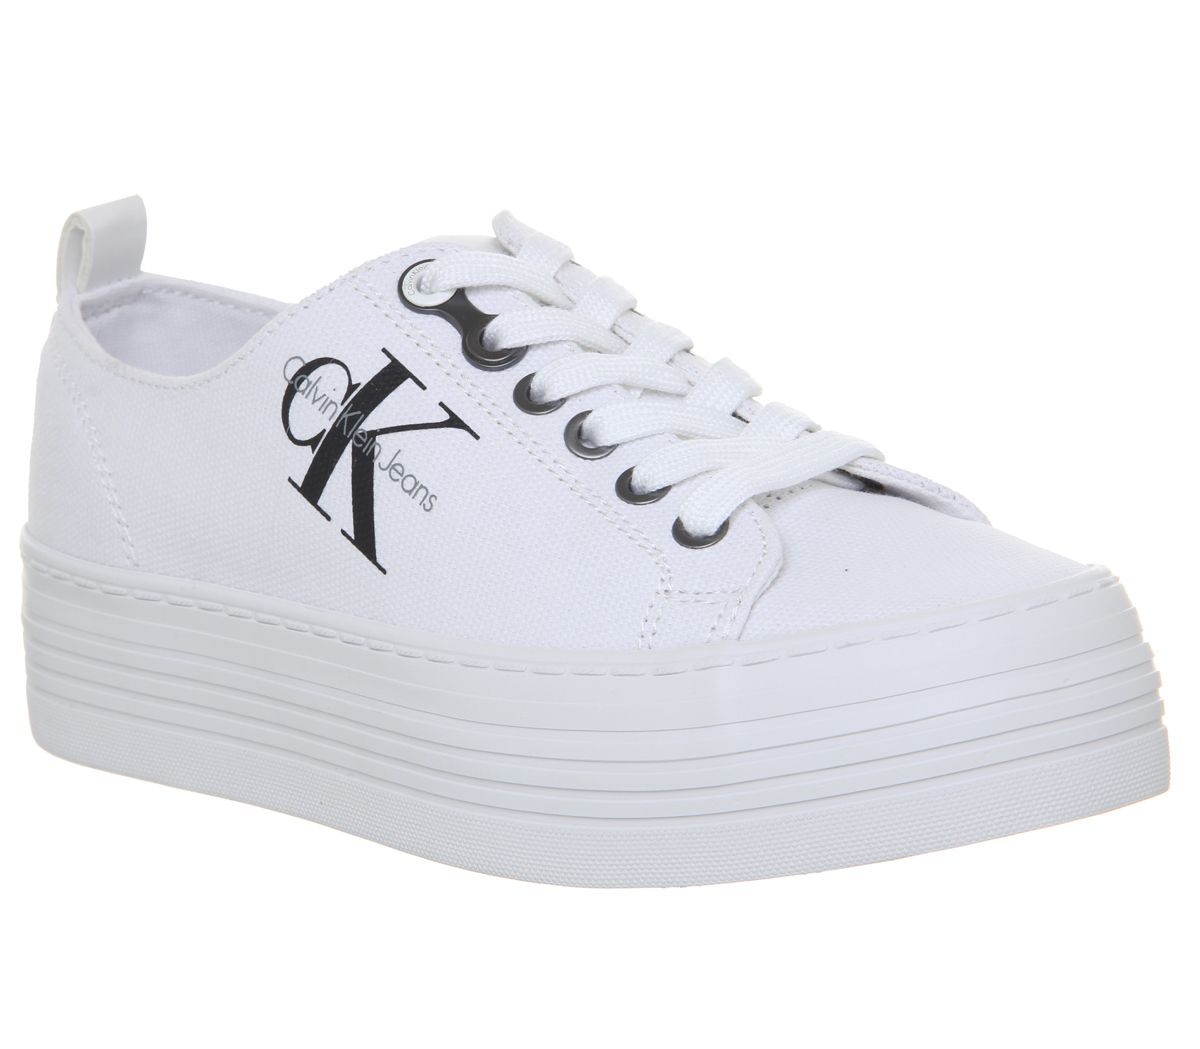 a946bb34b1 Womens Calvin Klein Zolah Flatform Trainers White Canvas Trainers ...